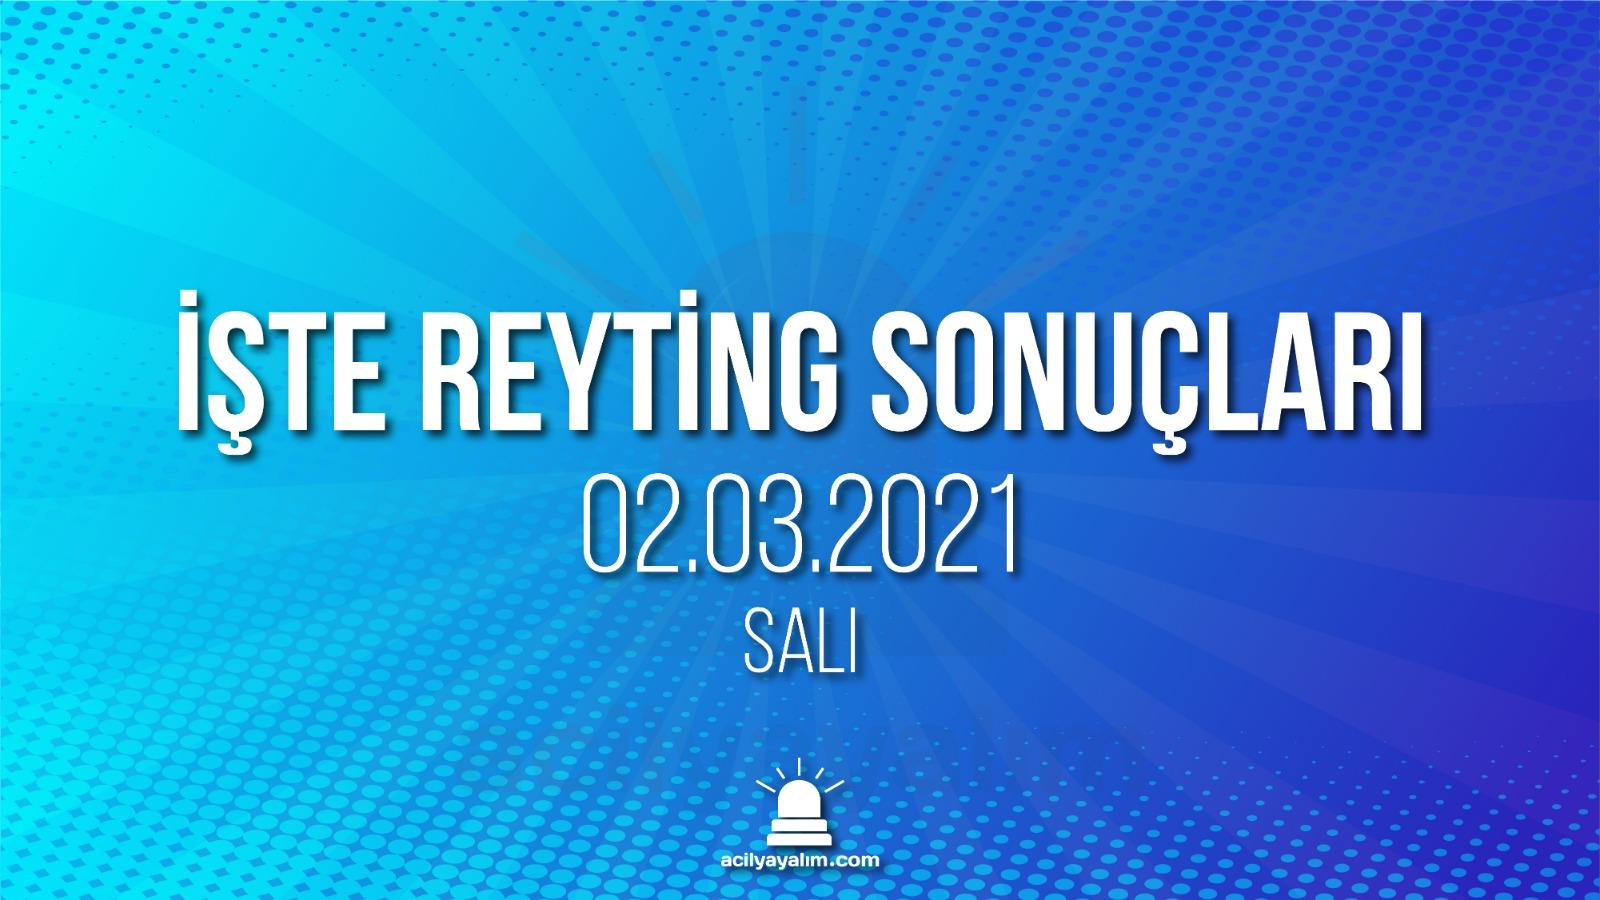 2 Mart 2021 Salı reyting sonuçları